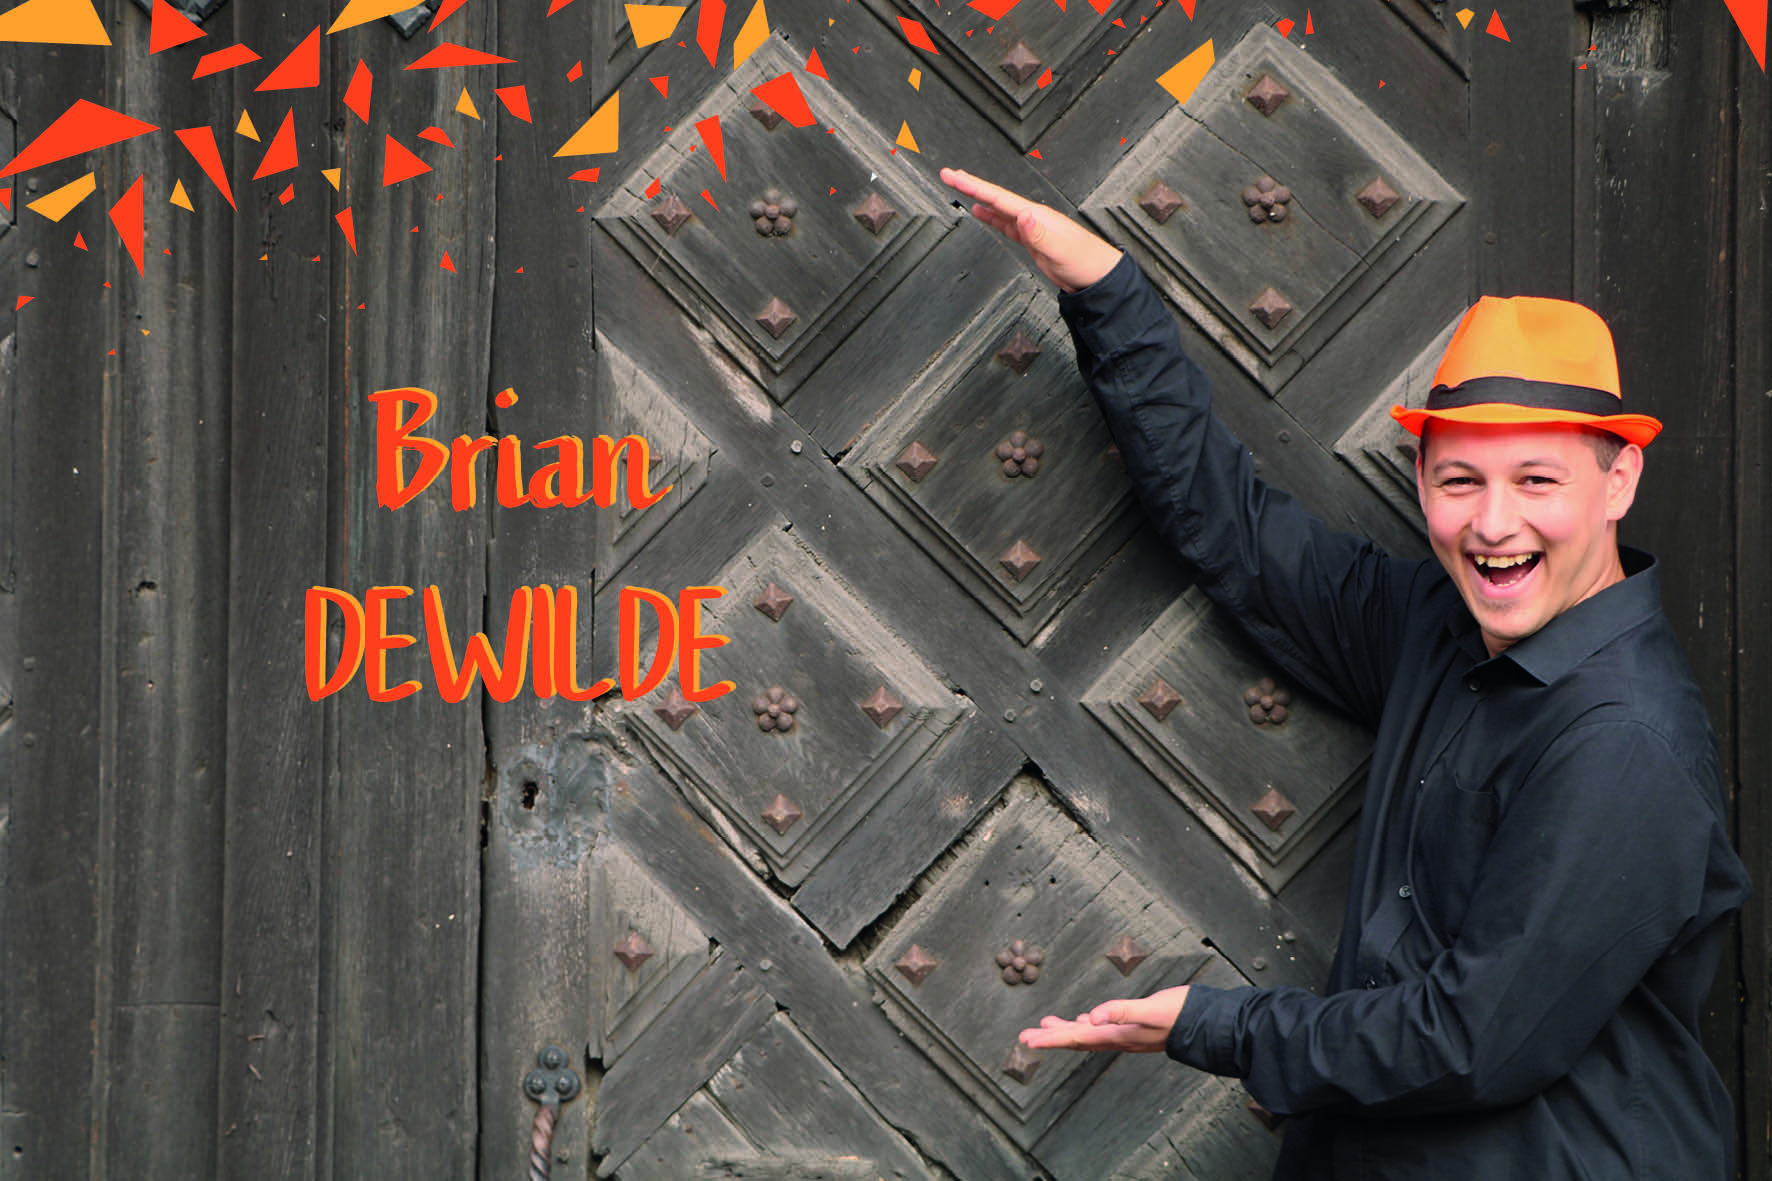 Brian Dewilde